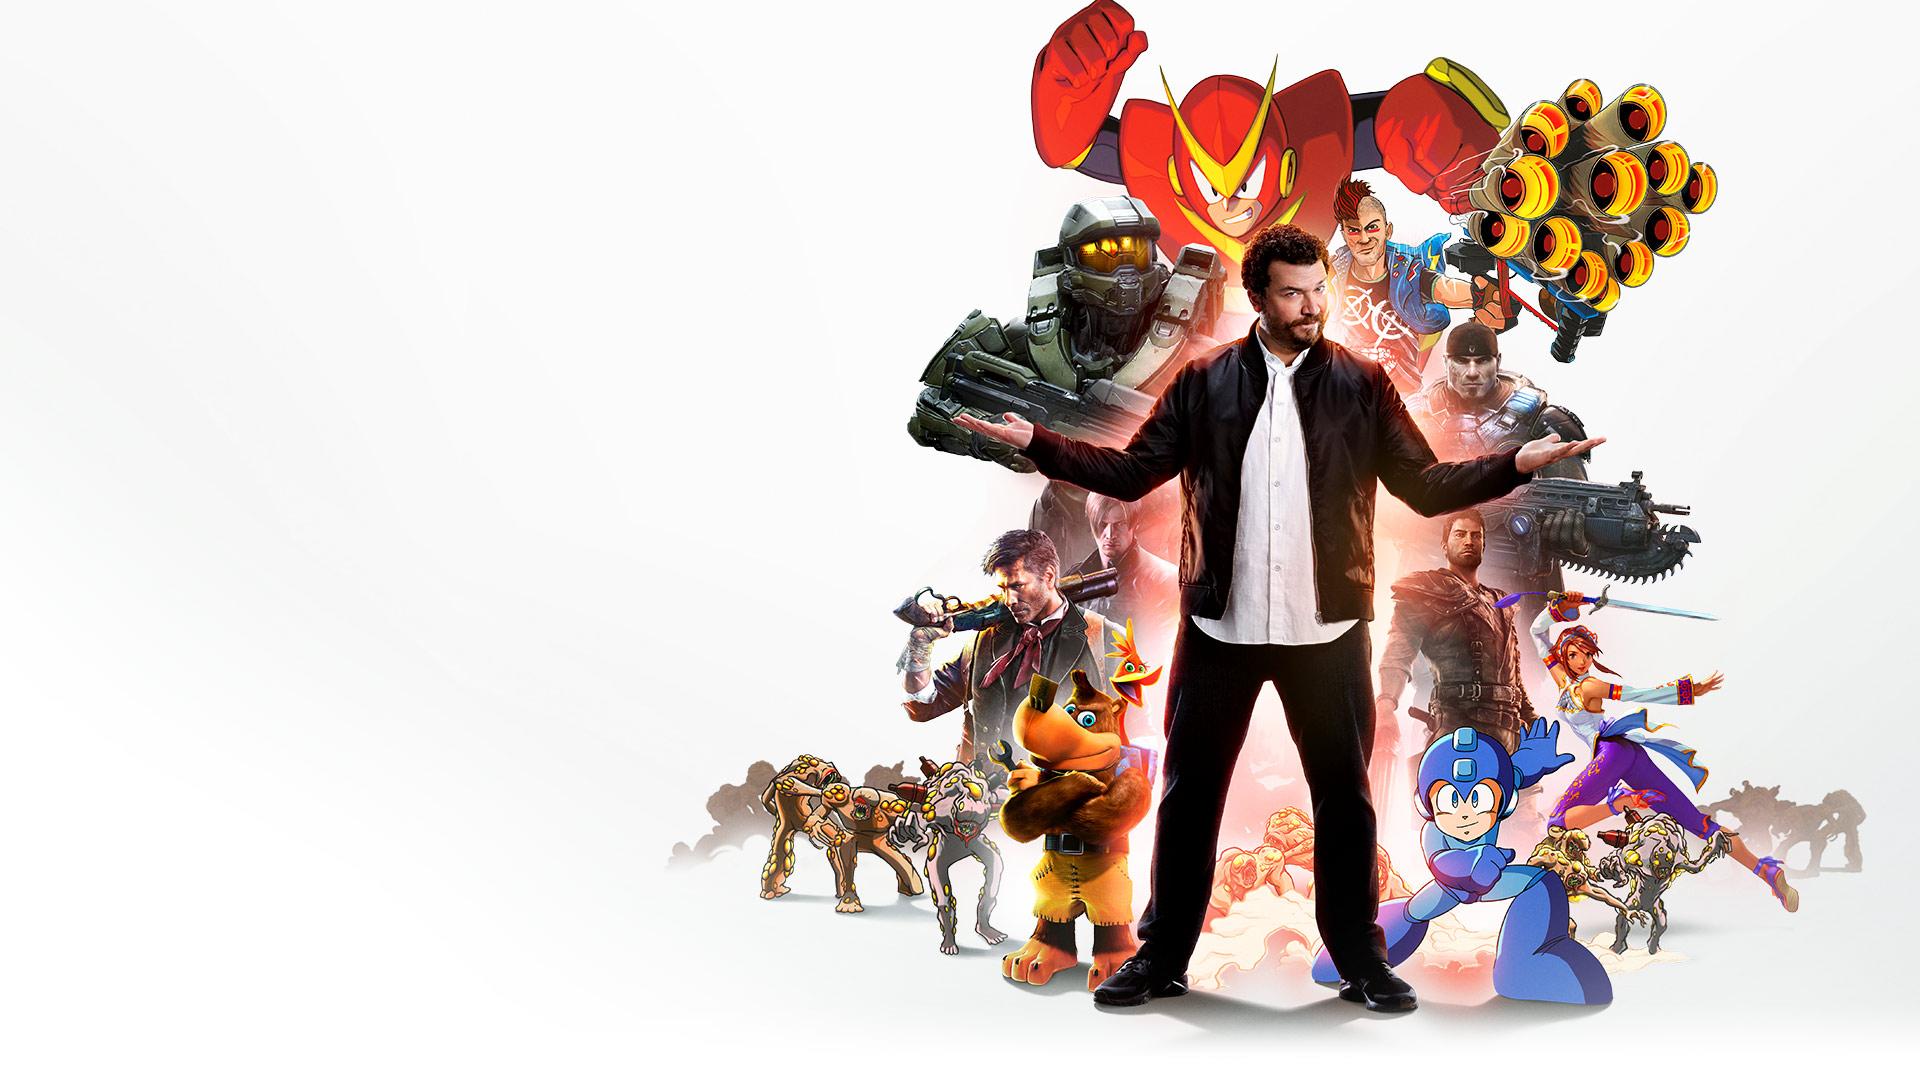 Дэнни Макбрайд на фоне коллажа из игр по абонементу Xbox Game Pass